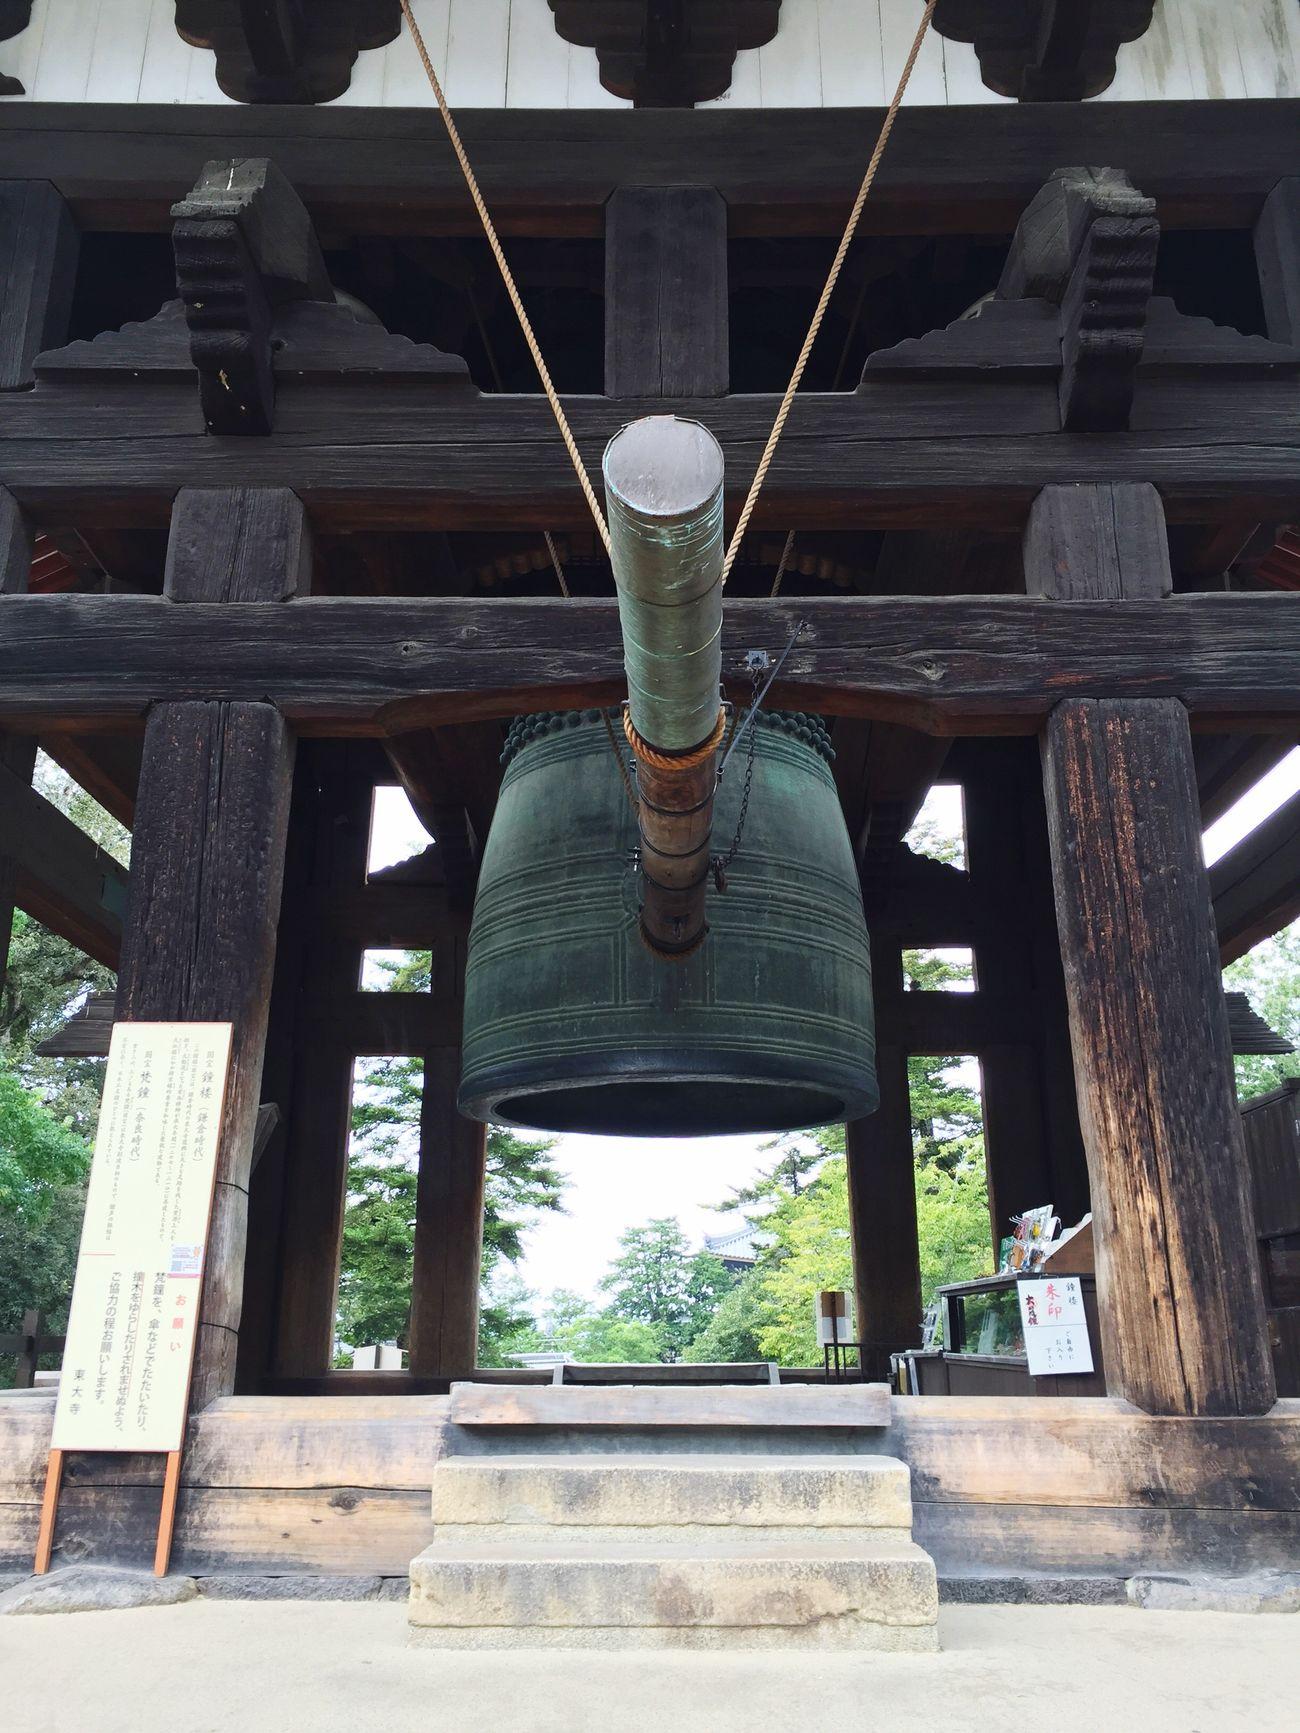 東大寺 奈良 Nara Japanese Temple Temple - Building Temples Nara,Japan Nara Temple Temple Architecture Nara Park Nara Japan Nara-shi